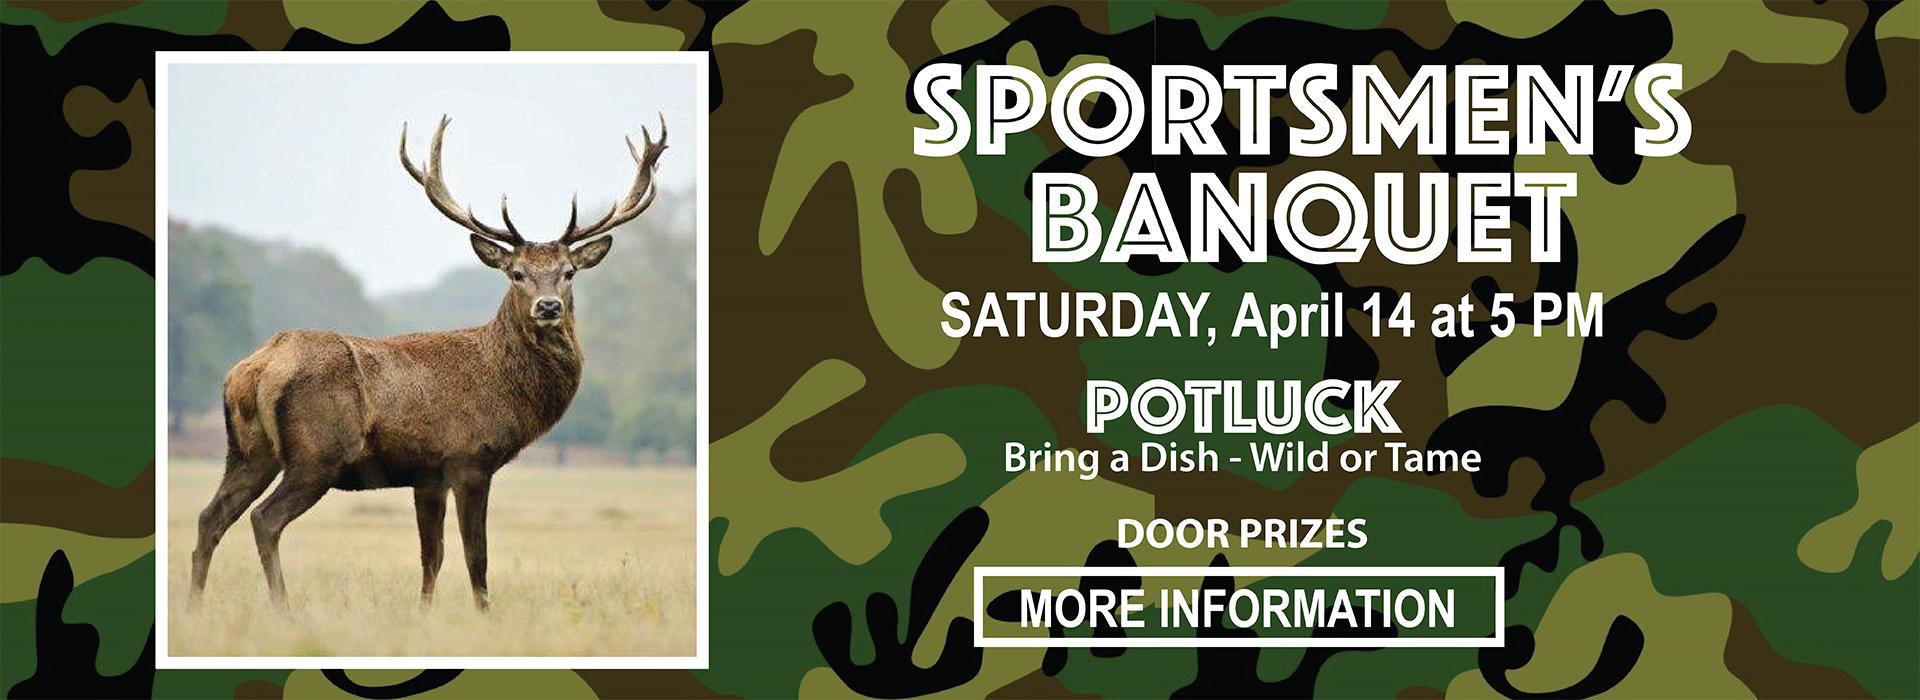 Sportmens-Banquet2018